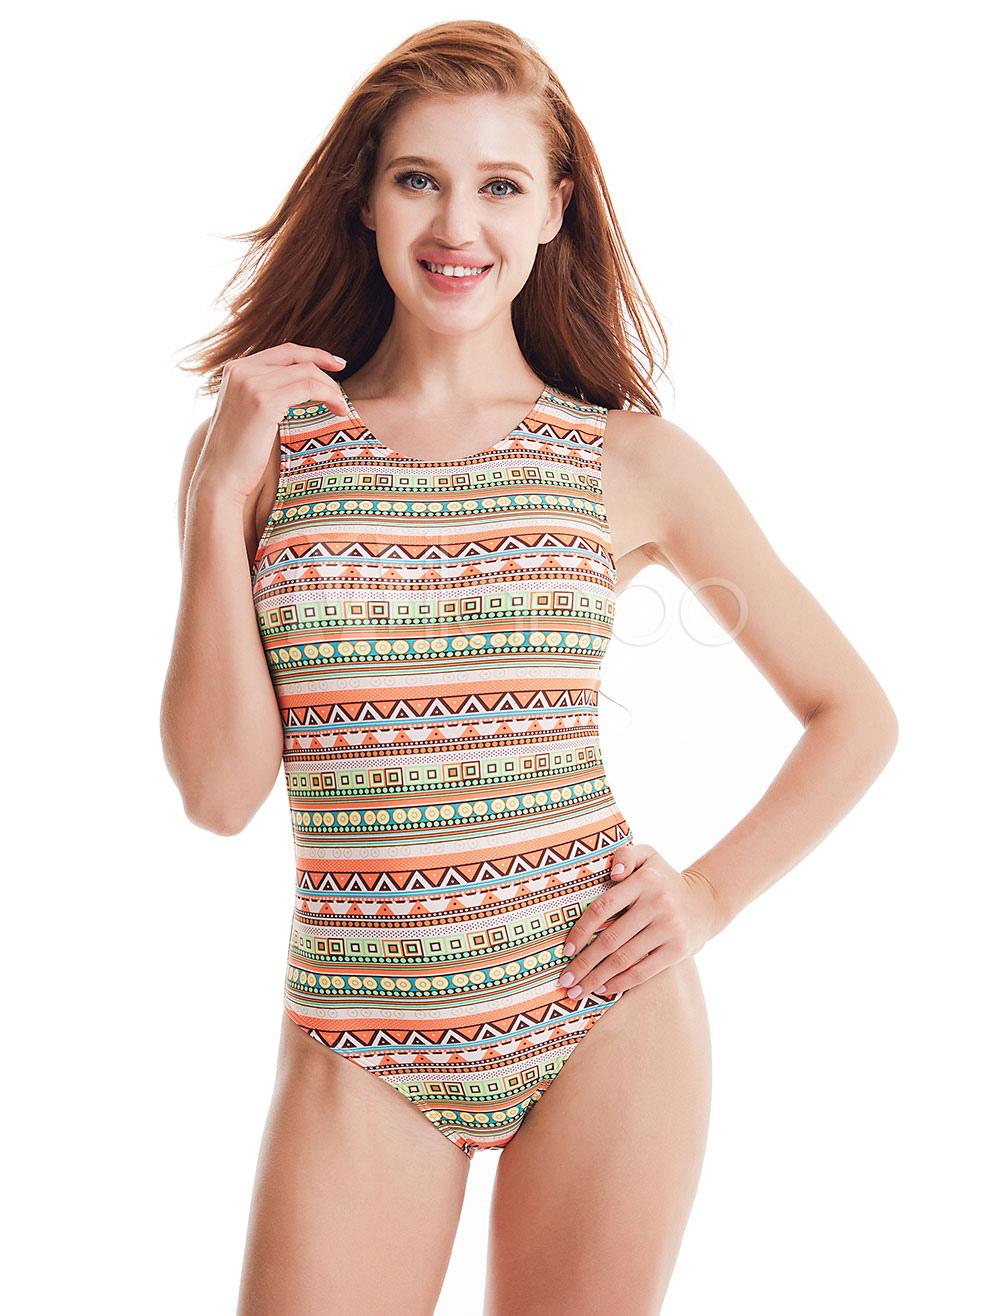 bf046c408e361 One Piece Swimsuit Sleeveless Round Neck Geometric Print Backless Orange  Women Bathing Suits-No. 1. 40%OFF. Color:Orange